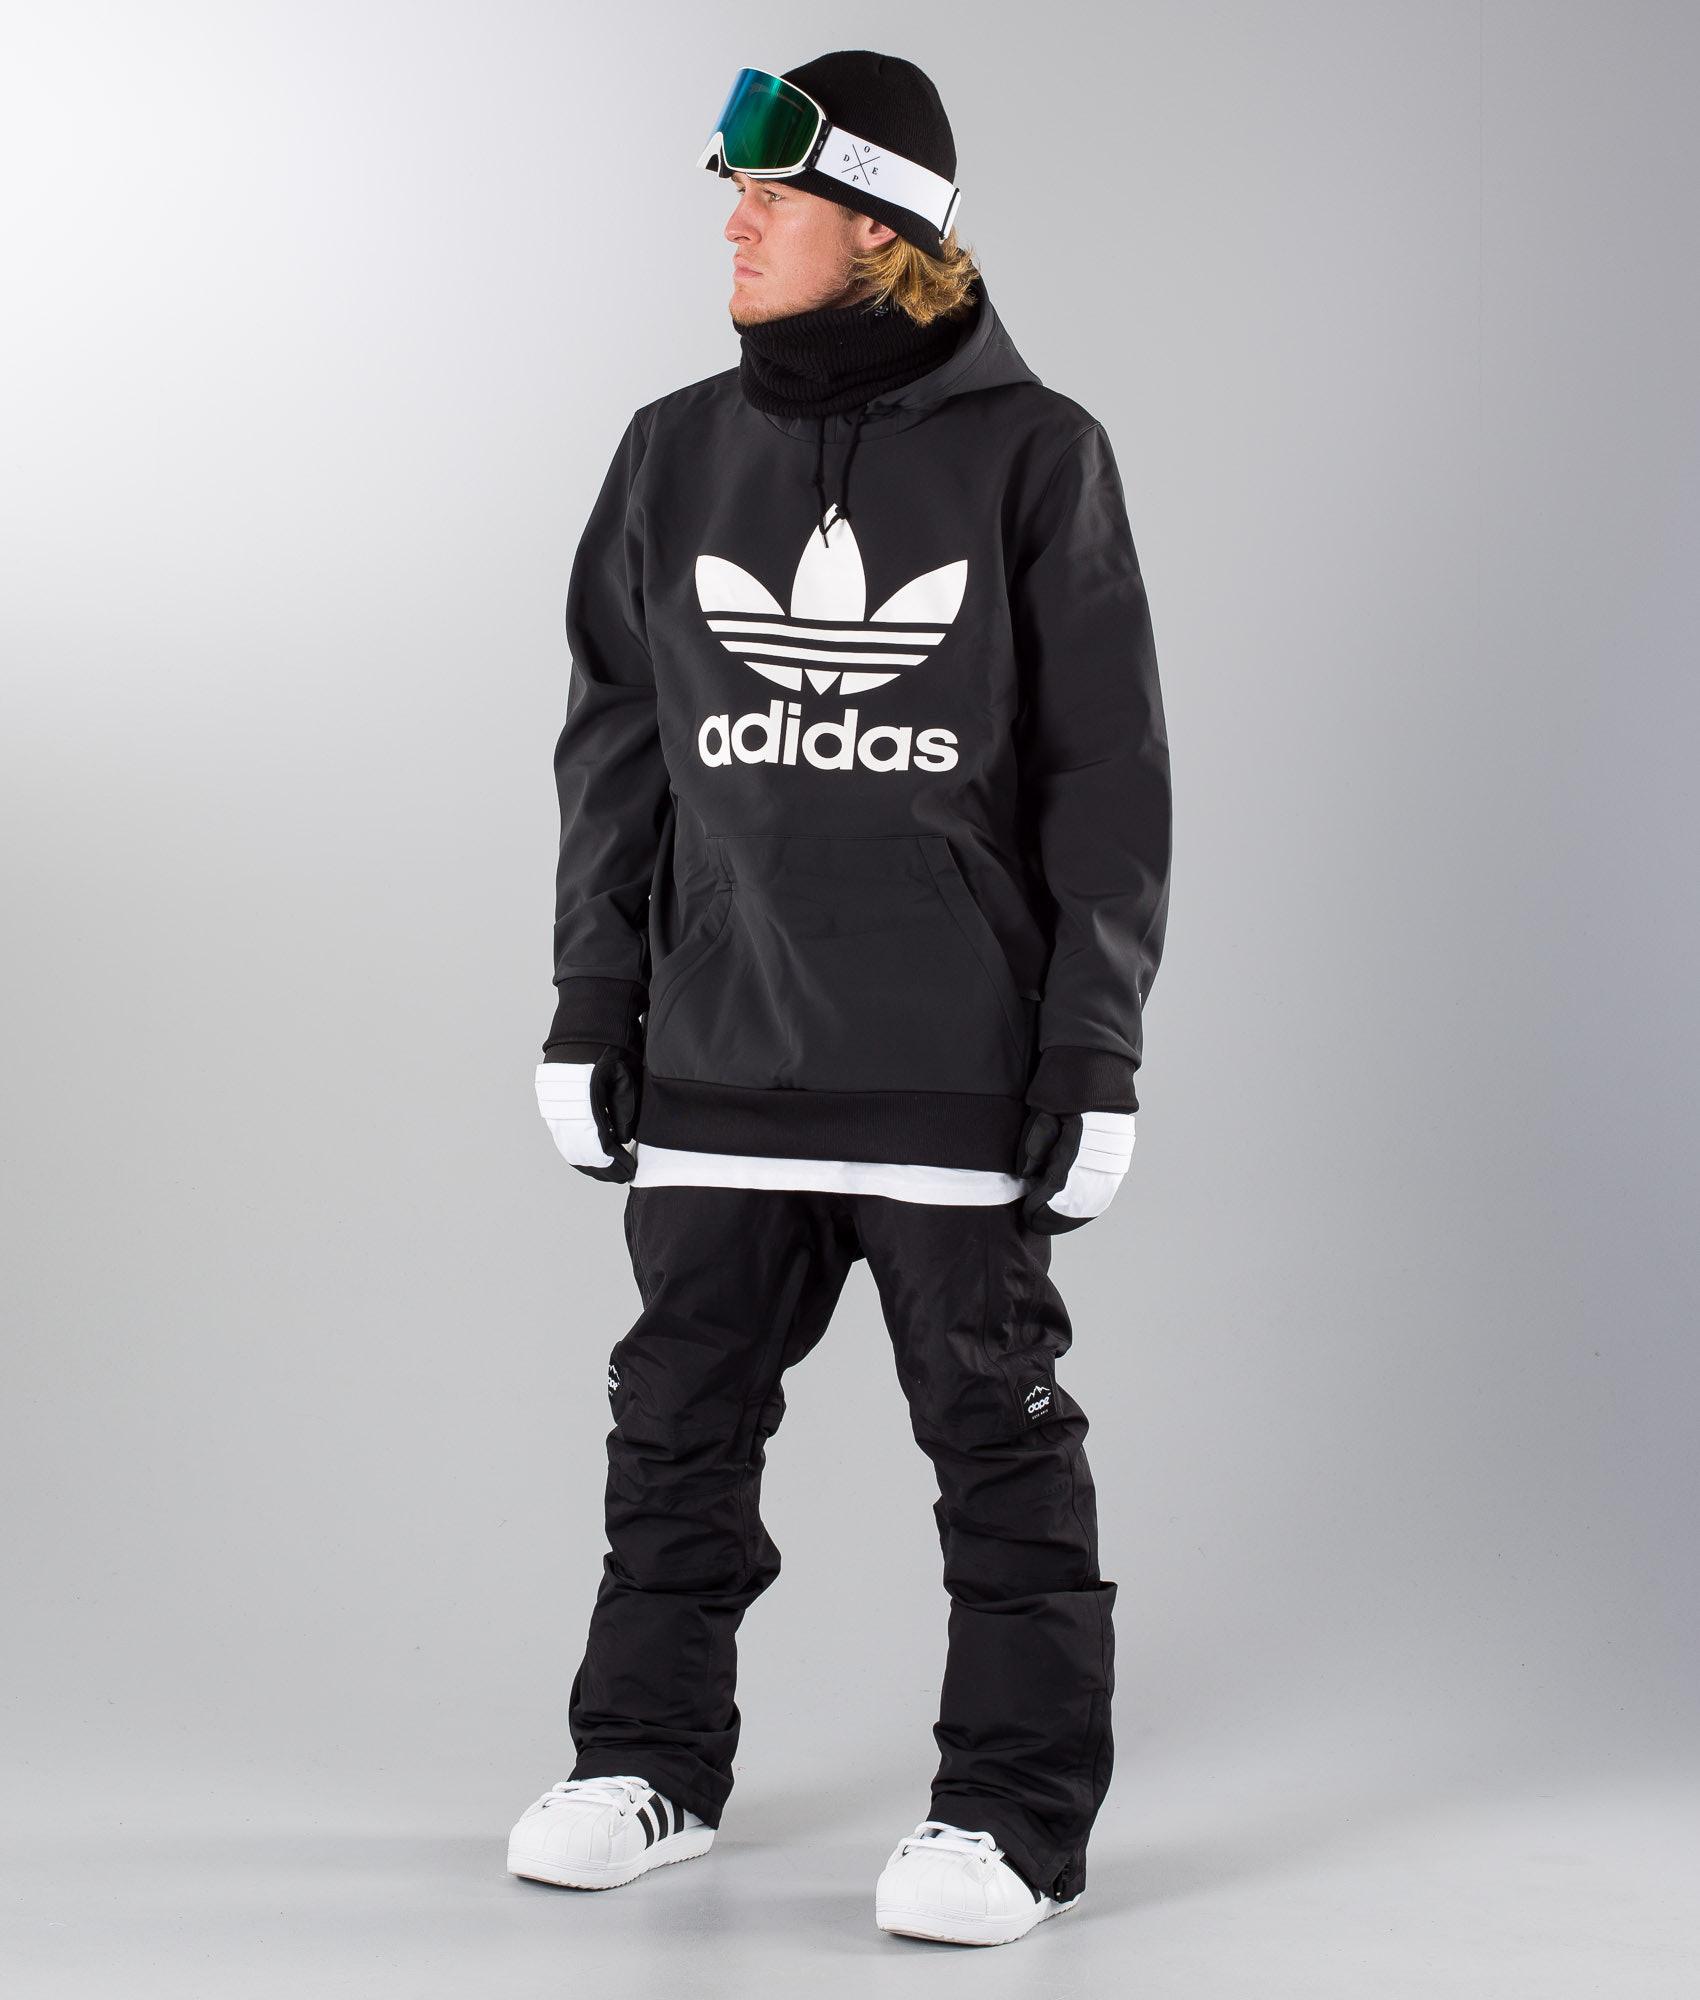 9e0eabe4434e Adidas Snowboarding Team Tech Snowboard Jacket Black White ...